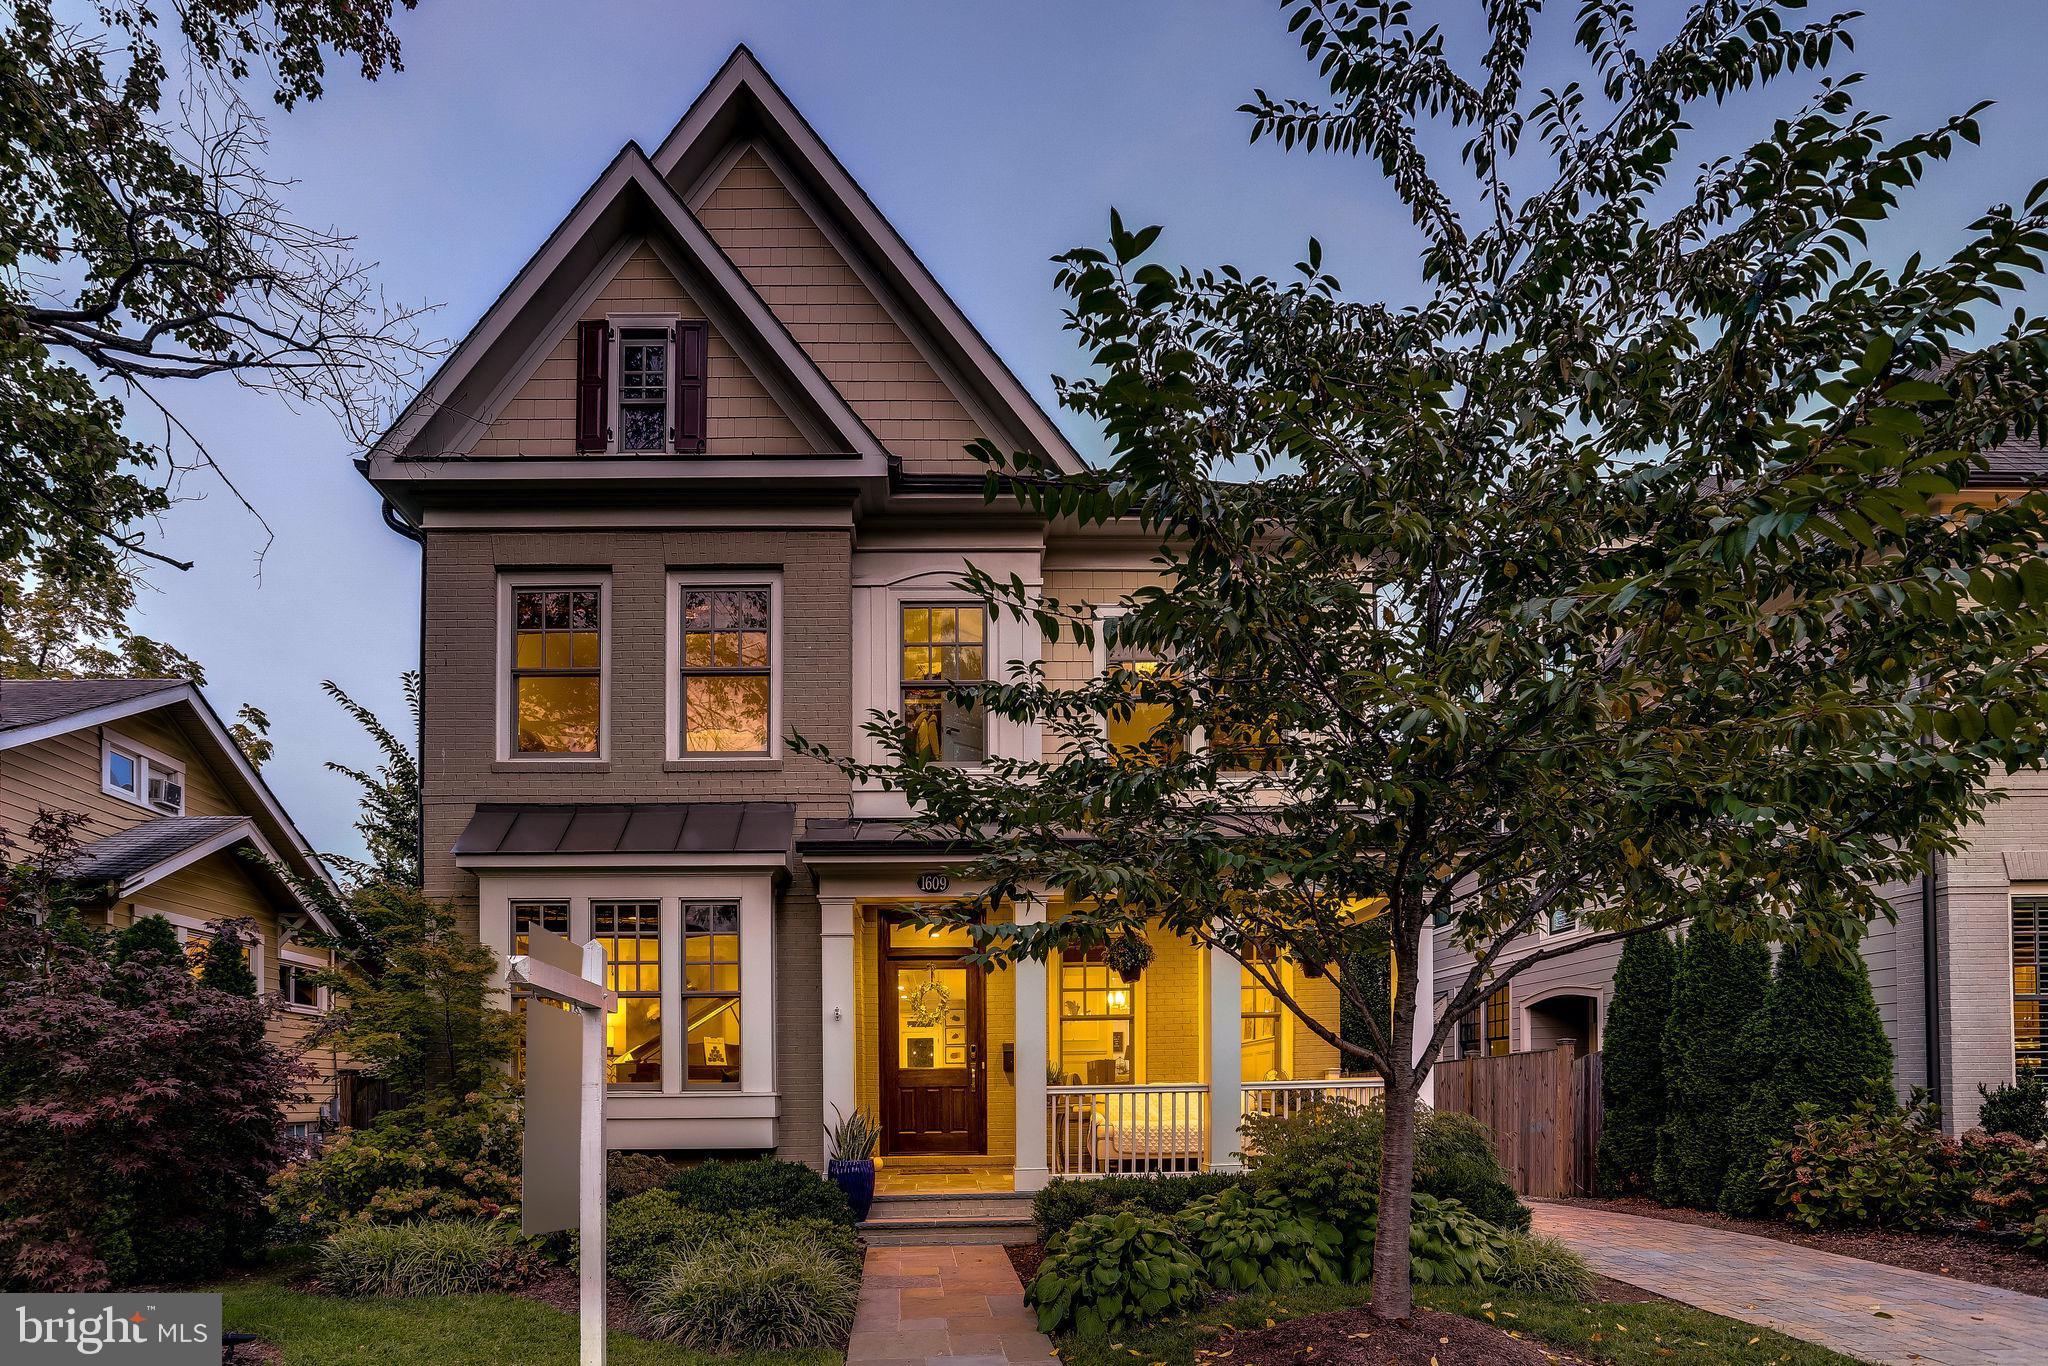 1609 N Garfield St, Arlington, VA, 22201